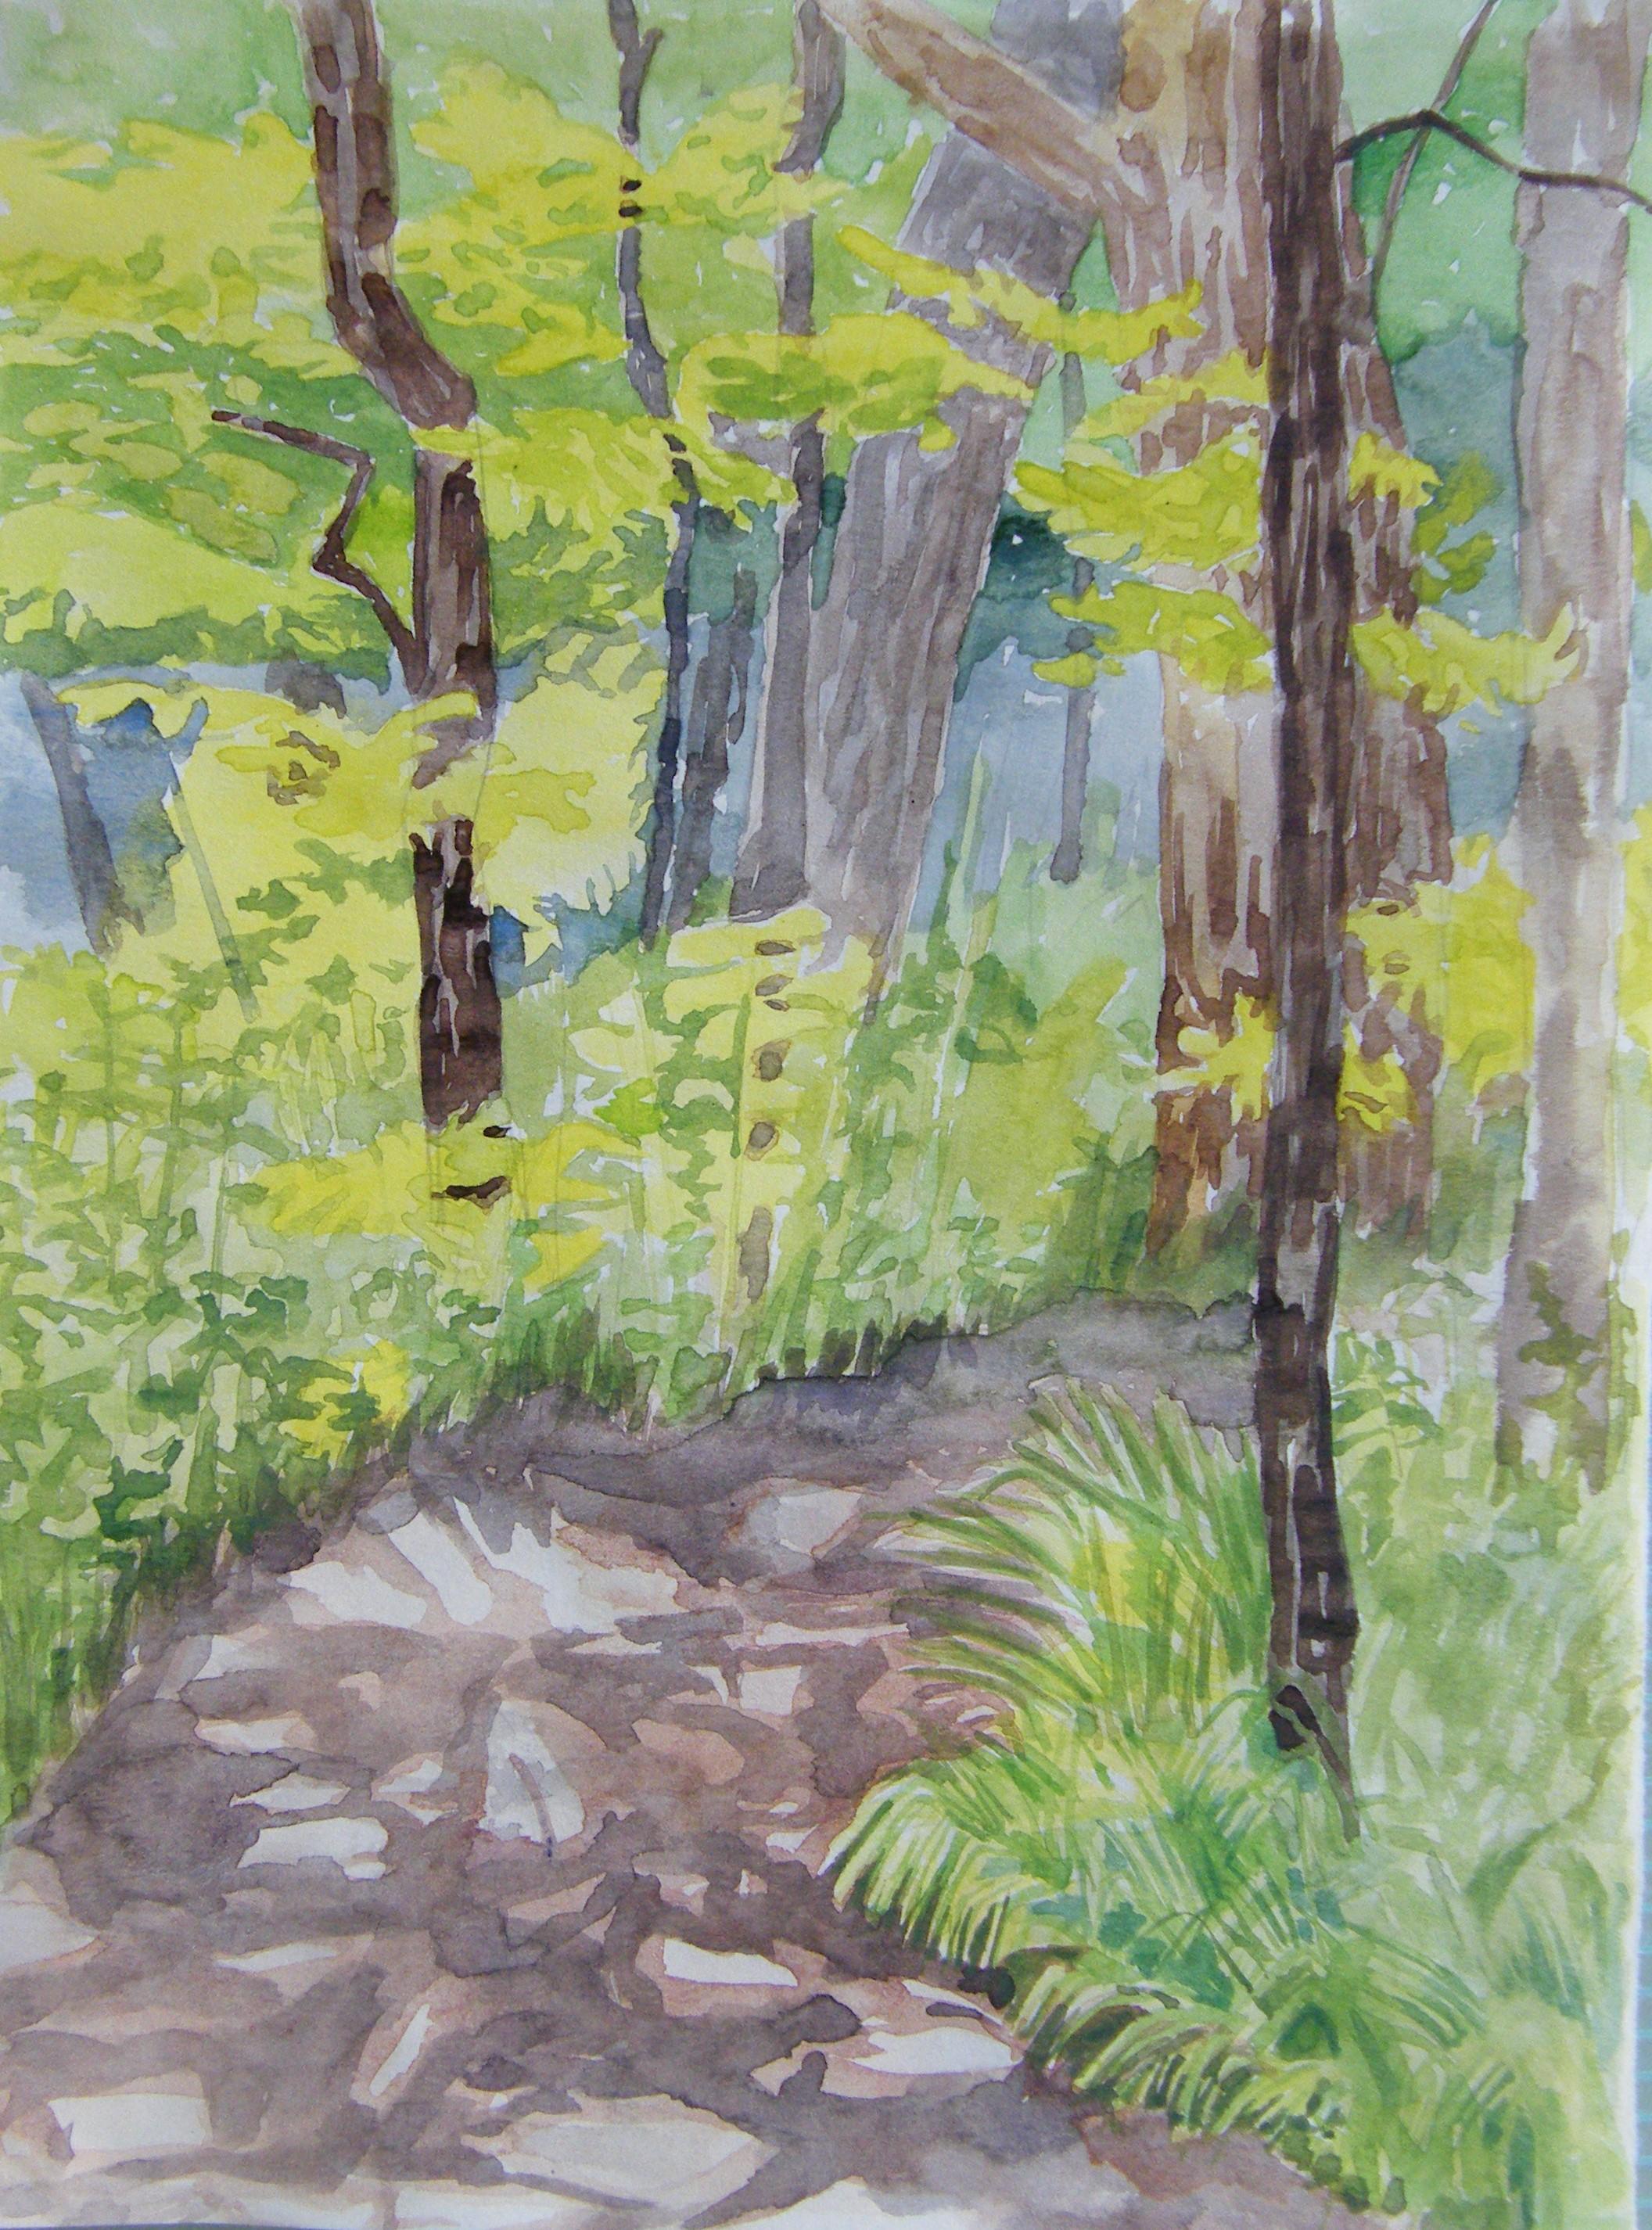 woods next to Cub Creek